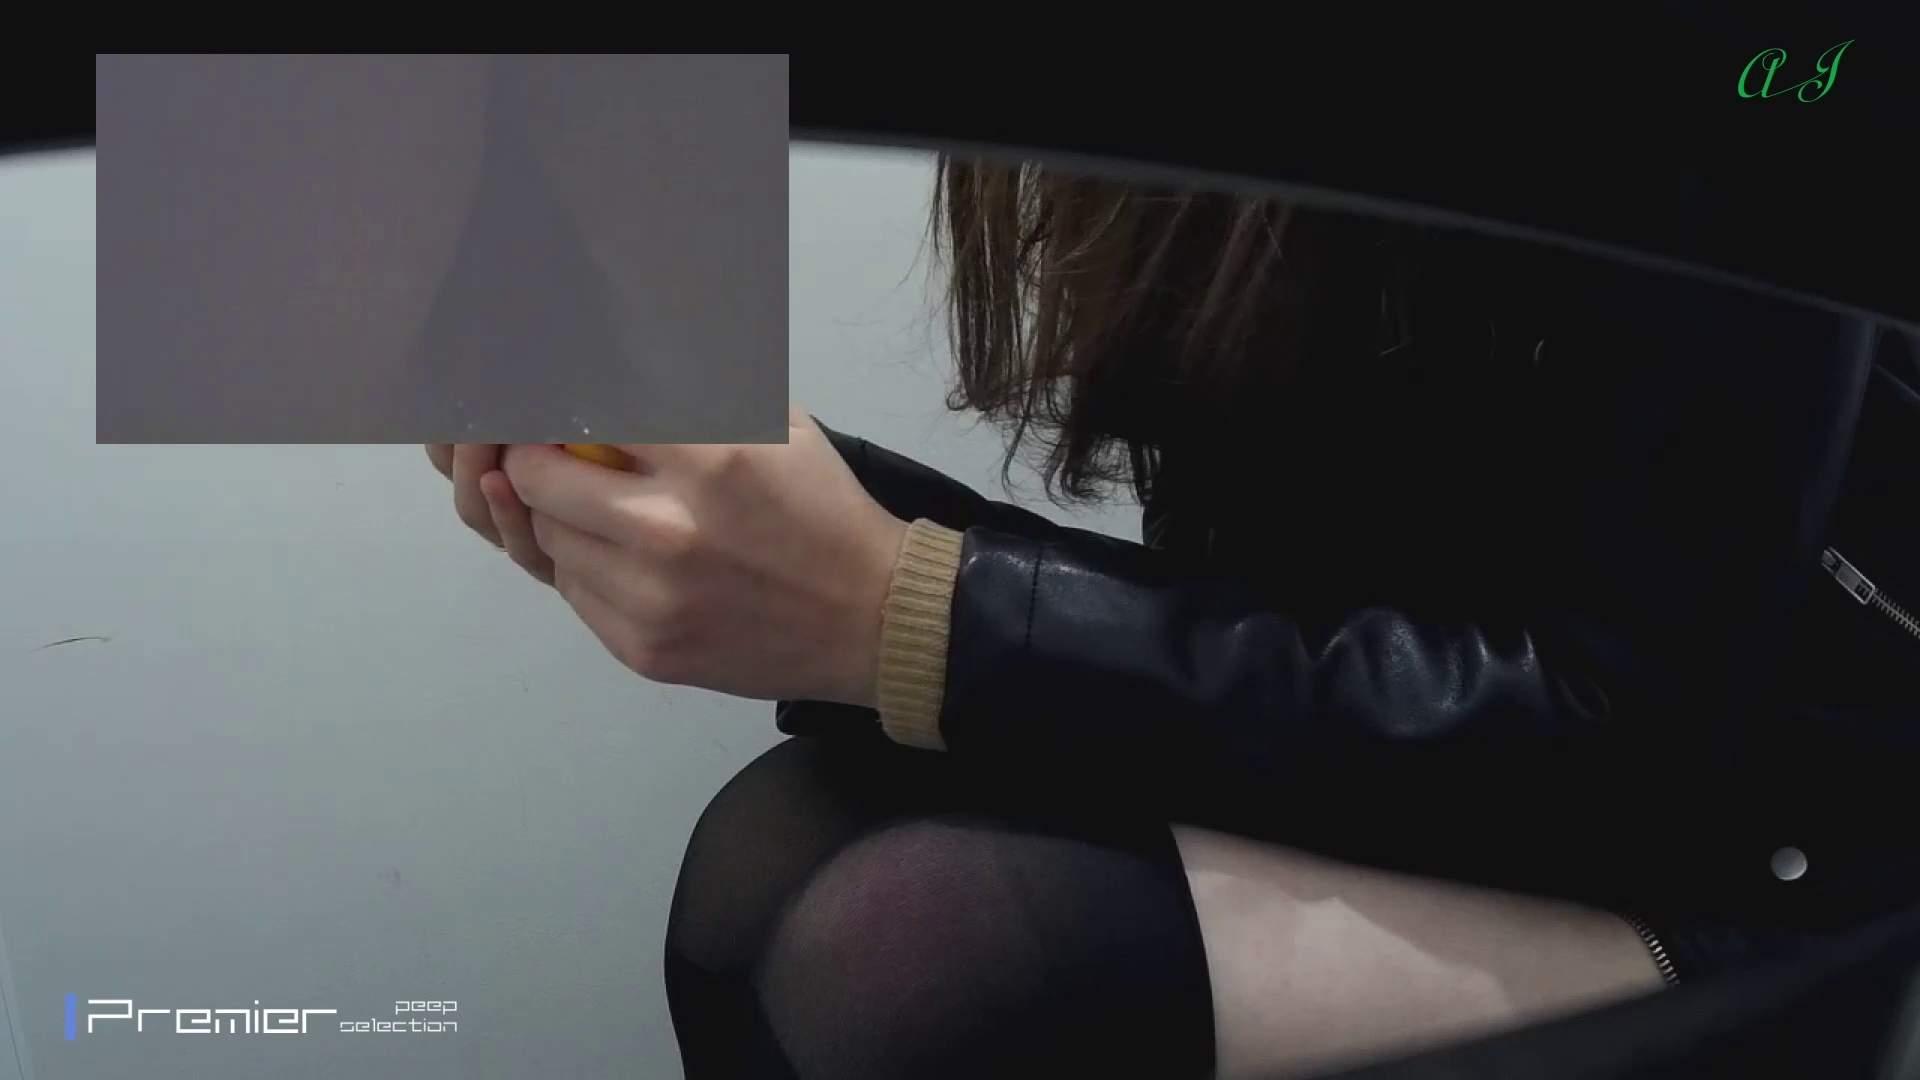 大あり美JDトイレ盗撮【有名大学女性洗面所 vol.80】 高画質  113PIX 14